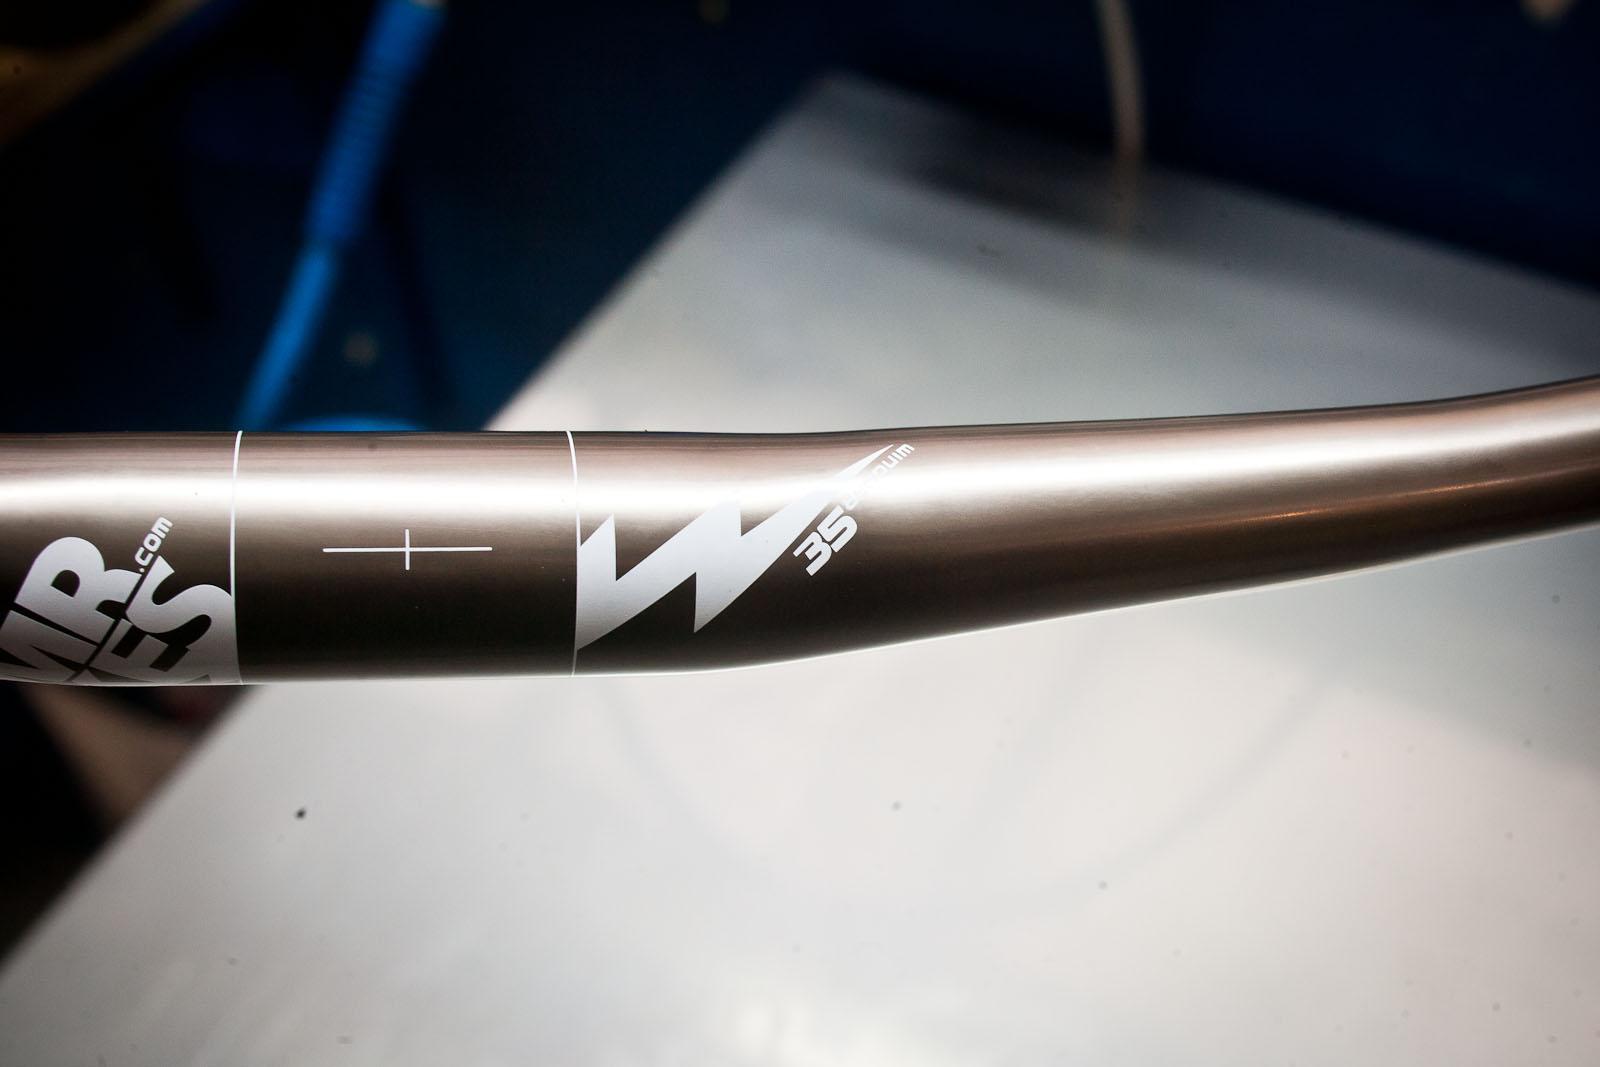 WM8J7392